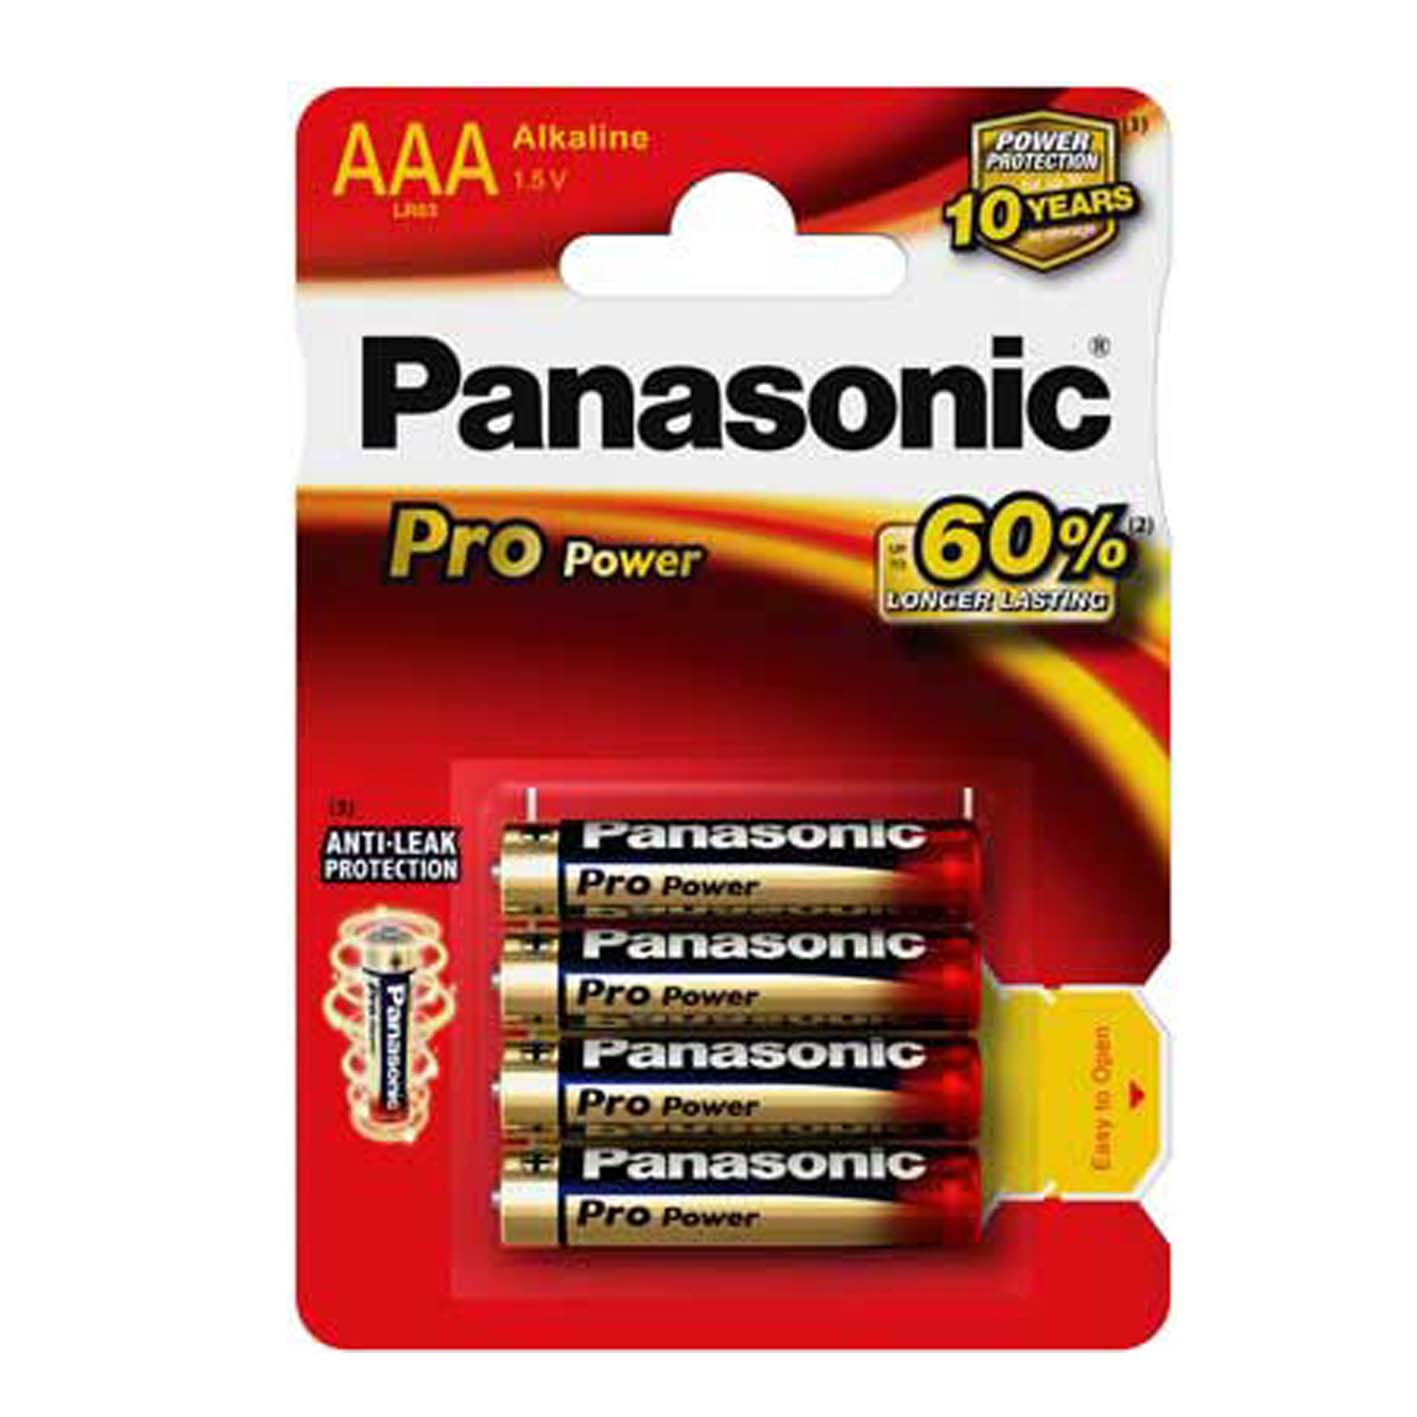 Panasonic Pro Power İnce Pil